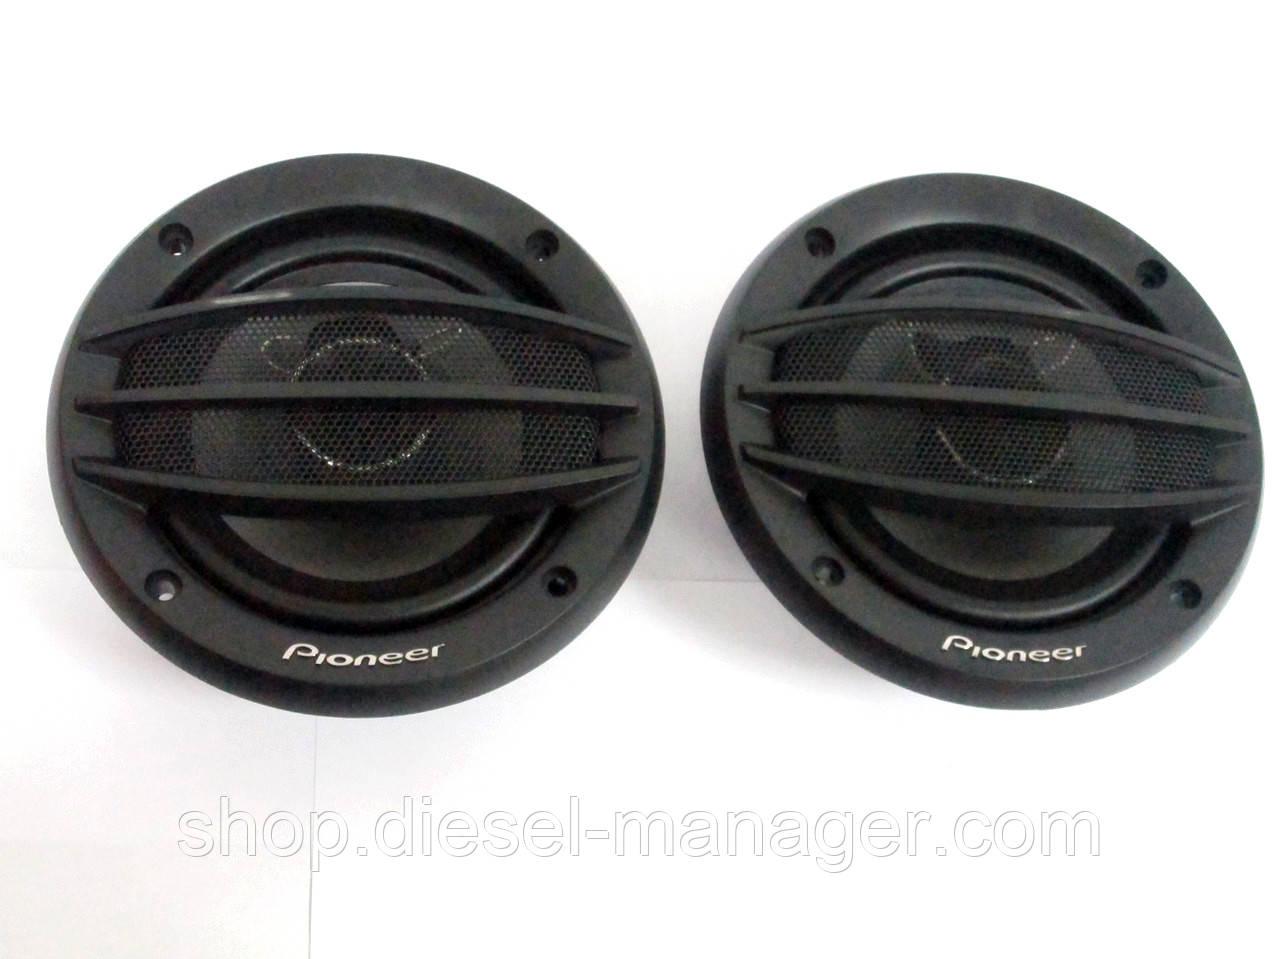 Автомобильная колонка Pioneer TS-A1374S 13 см Черная (004yl3yyn508)